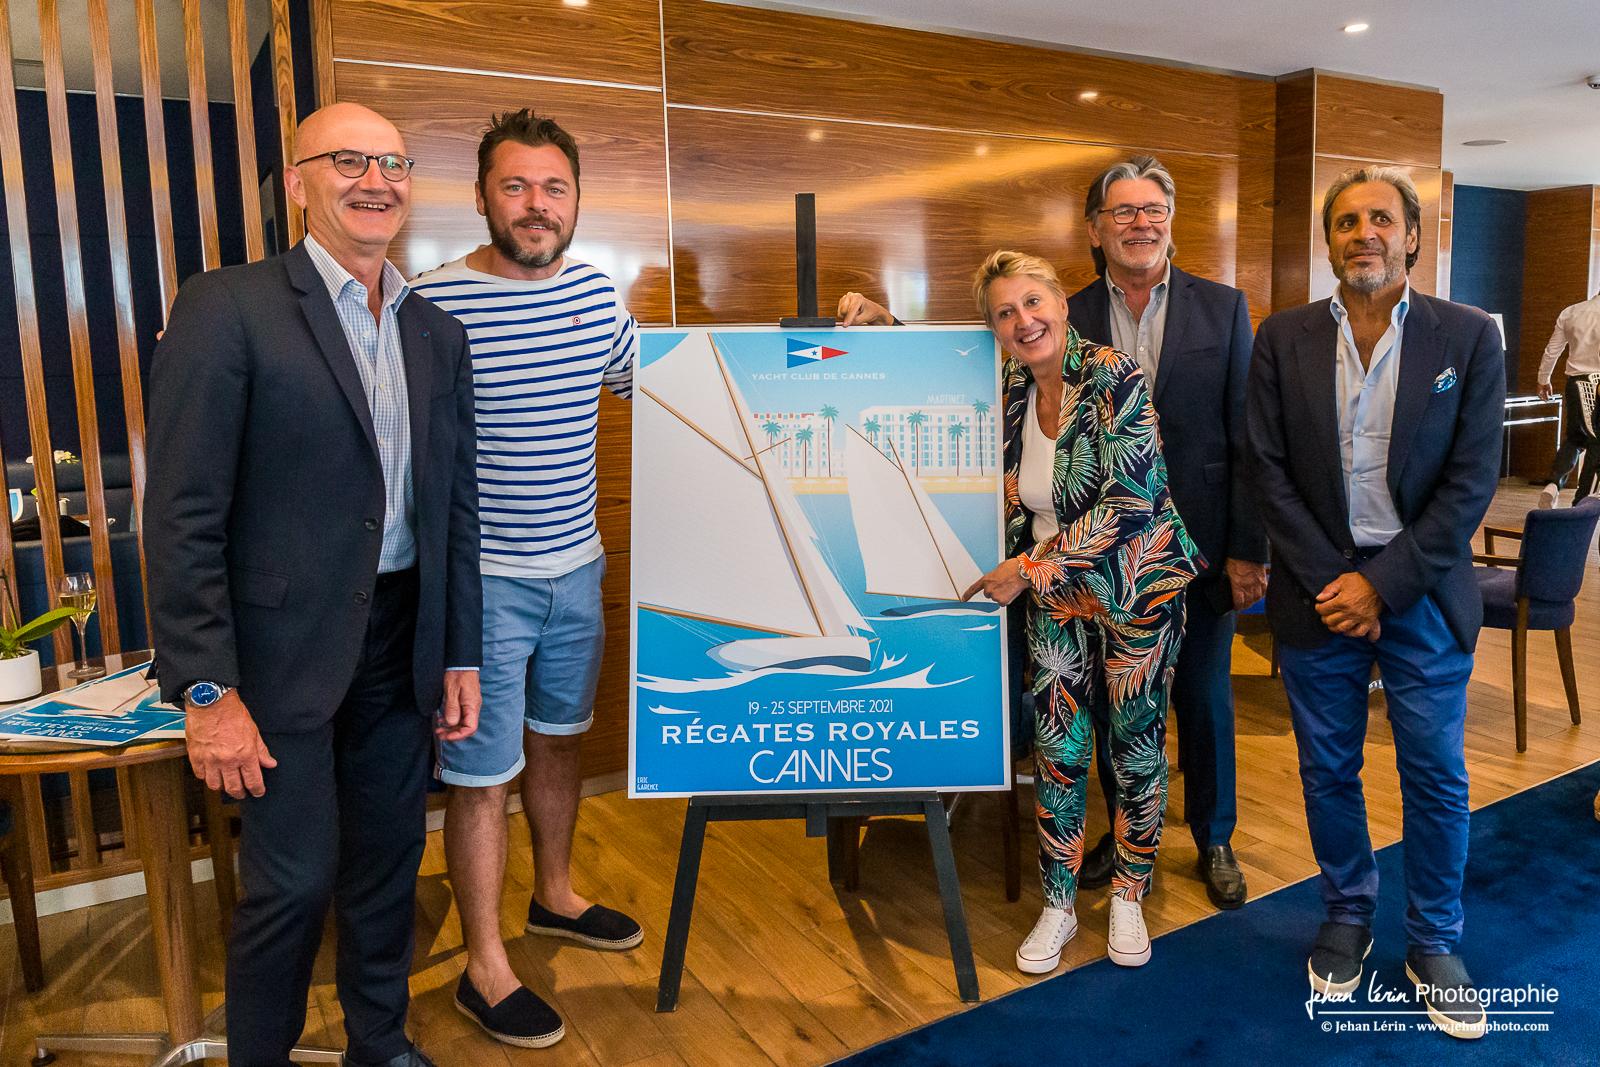 Partner Yachting Club de Cannes